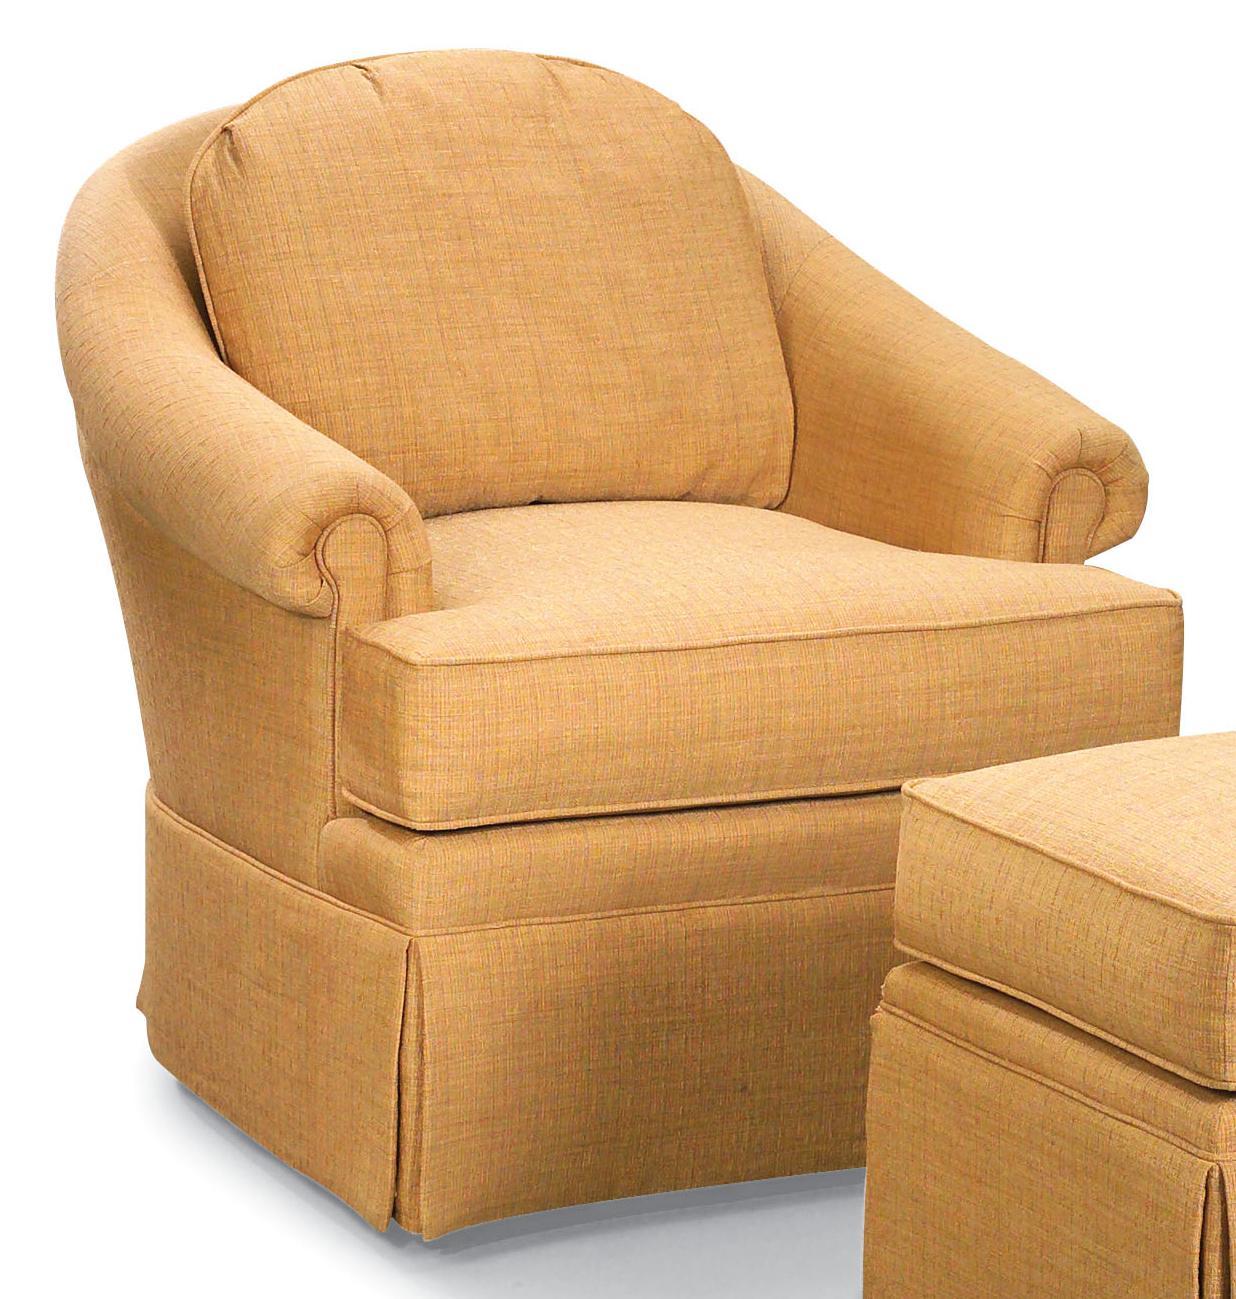 Swivel Accent Chair Bassett Accent Chairs Trent Swivel